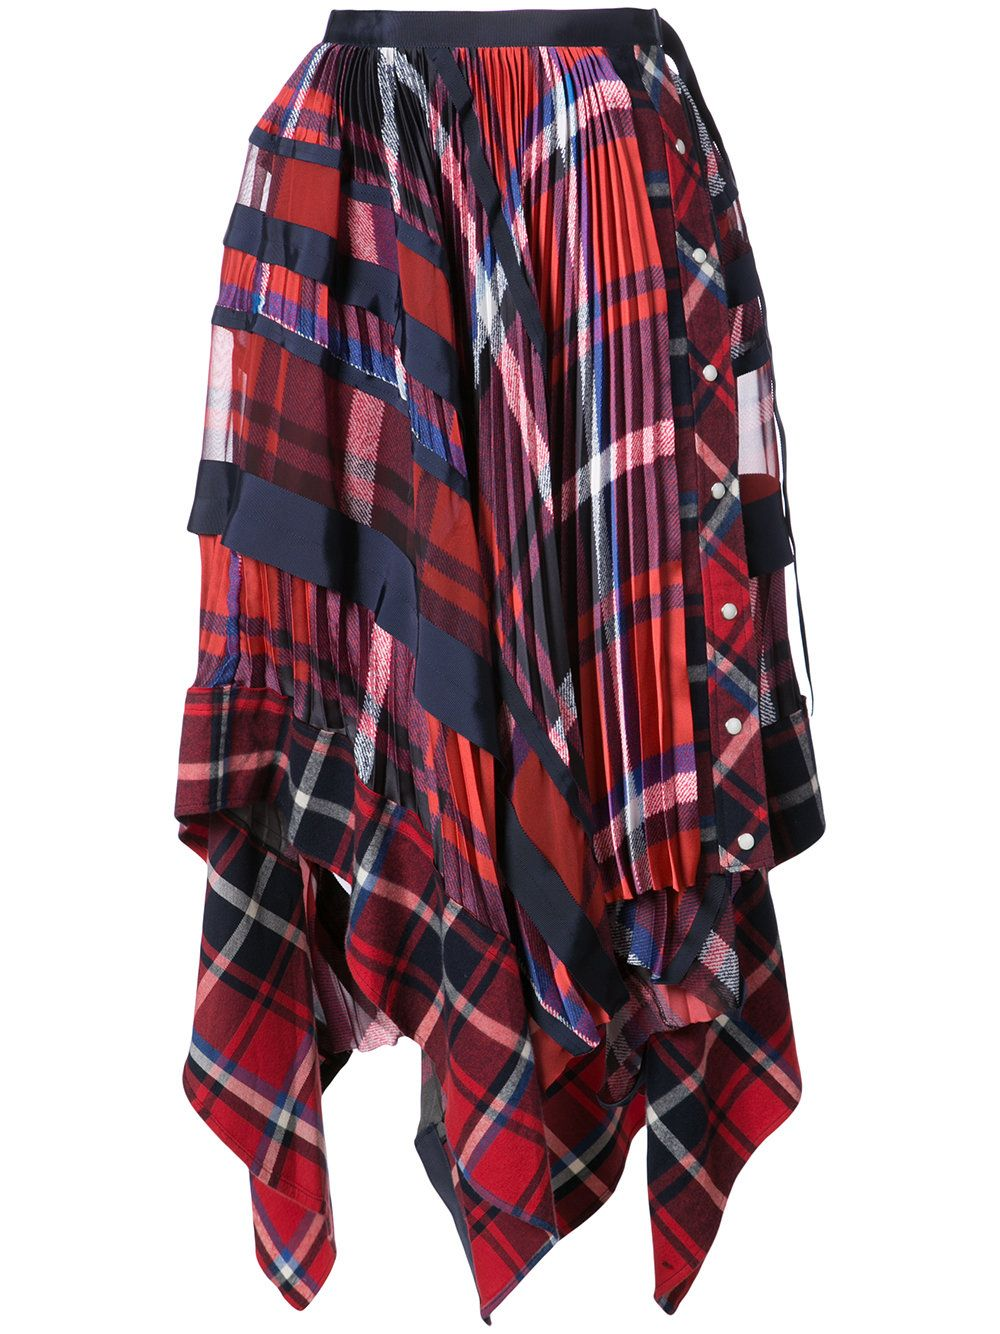 6516ec97f0 SACAI Handkerchief draped tartan skirt / Designer Style ID: 1703464 Colour:  961